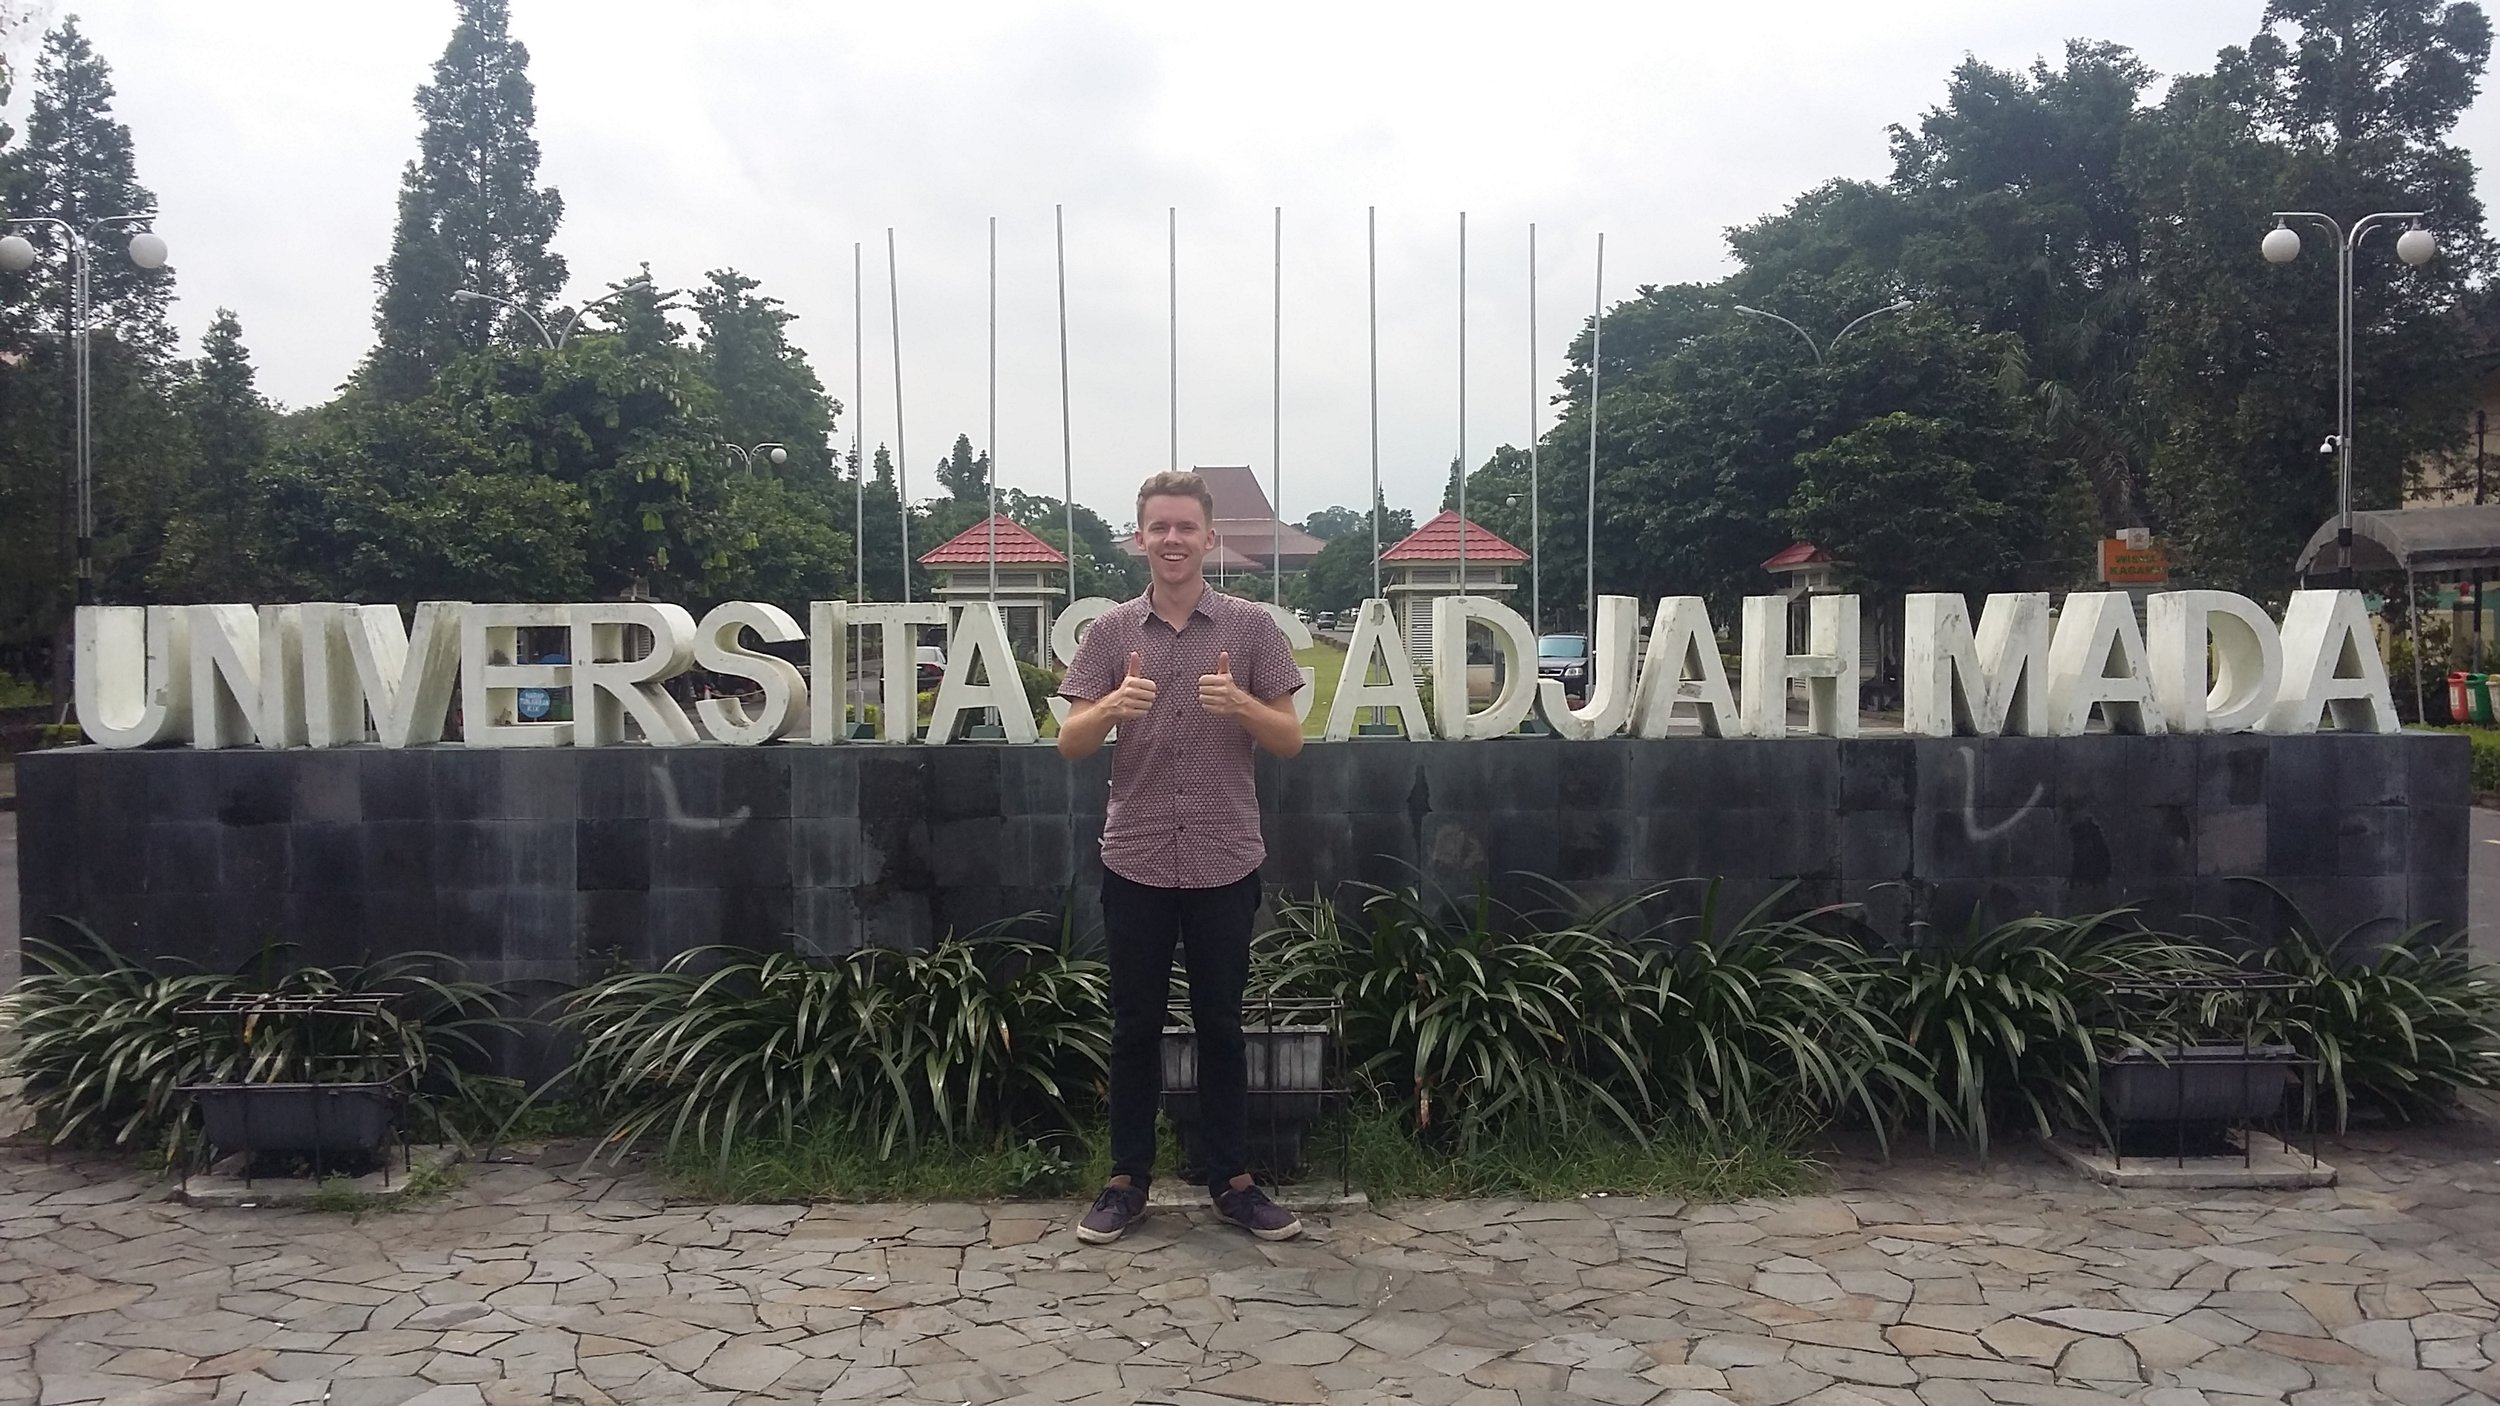 I studied Indonesian literature at Universitas Gadjah Mada in Yogyakarta. Credit - Lachlan